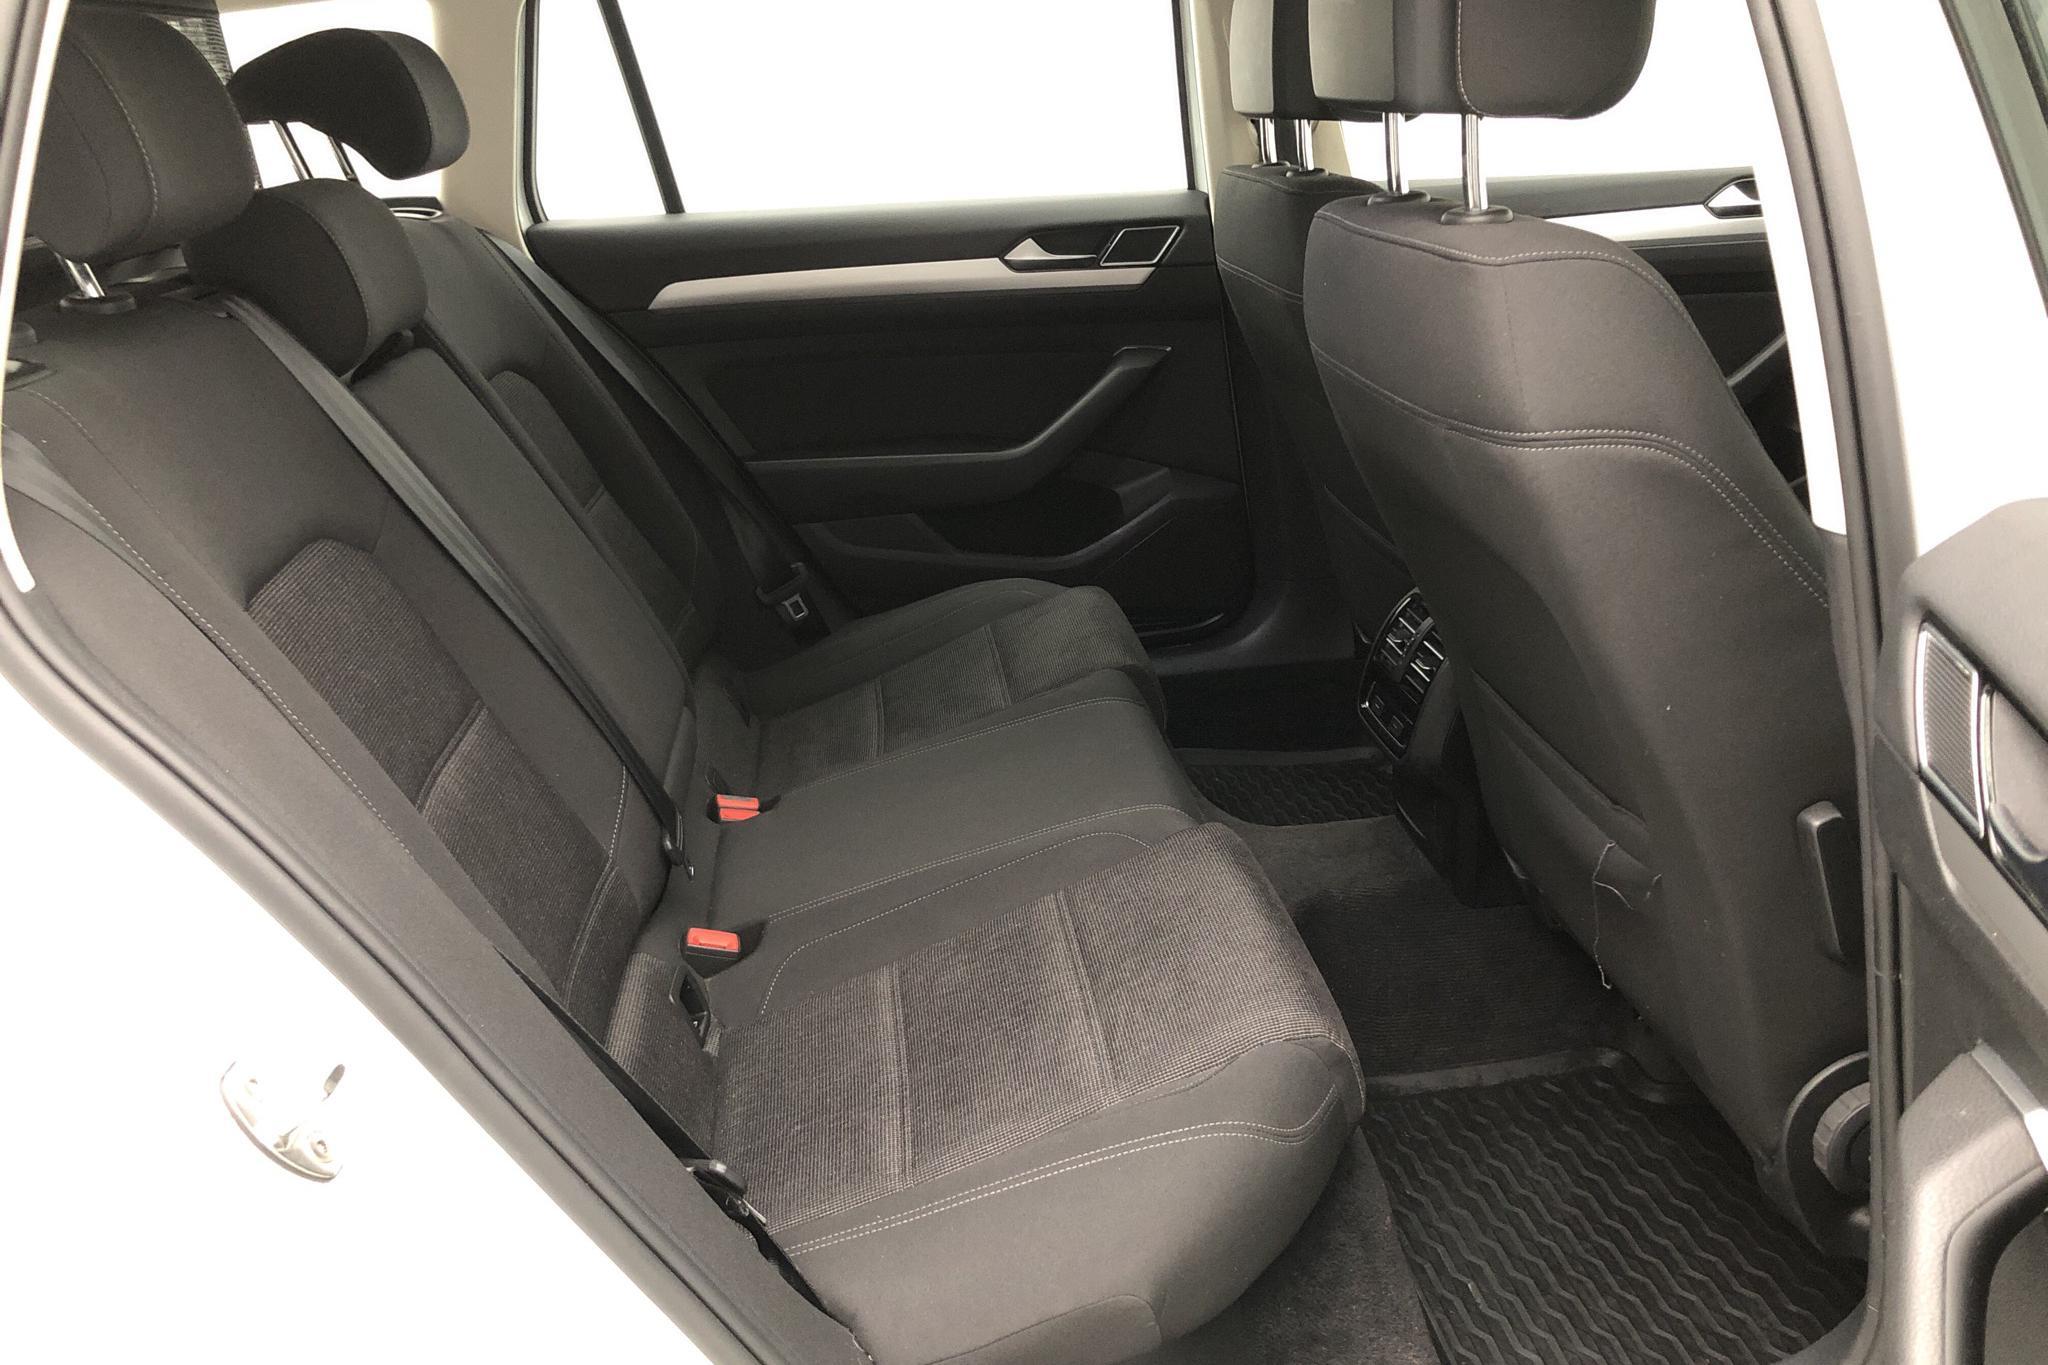 VW Passat 2.0 TDI Sportscombi (150hk) - 5 797 mil - Manuell - vit - 2016